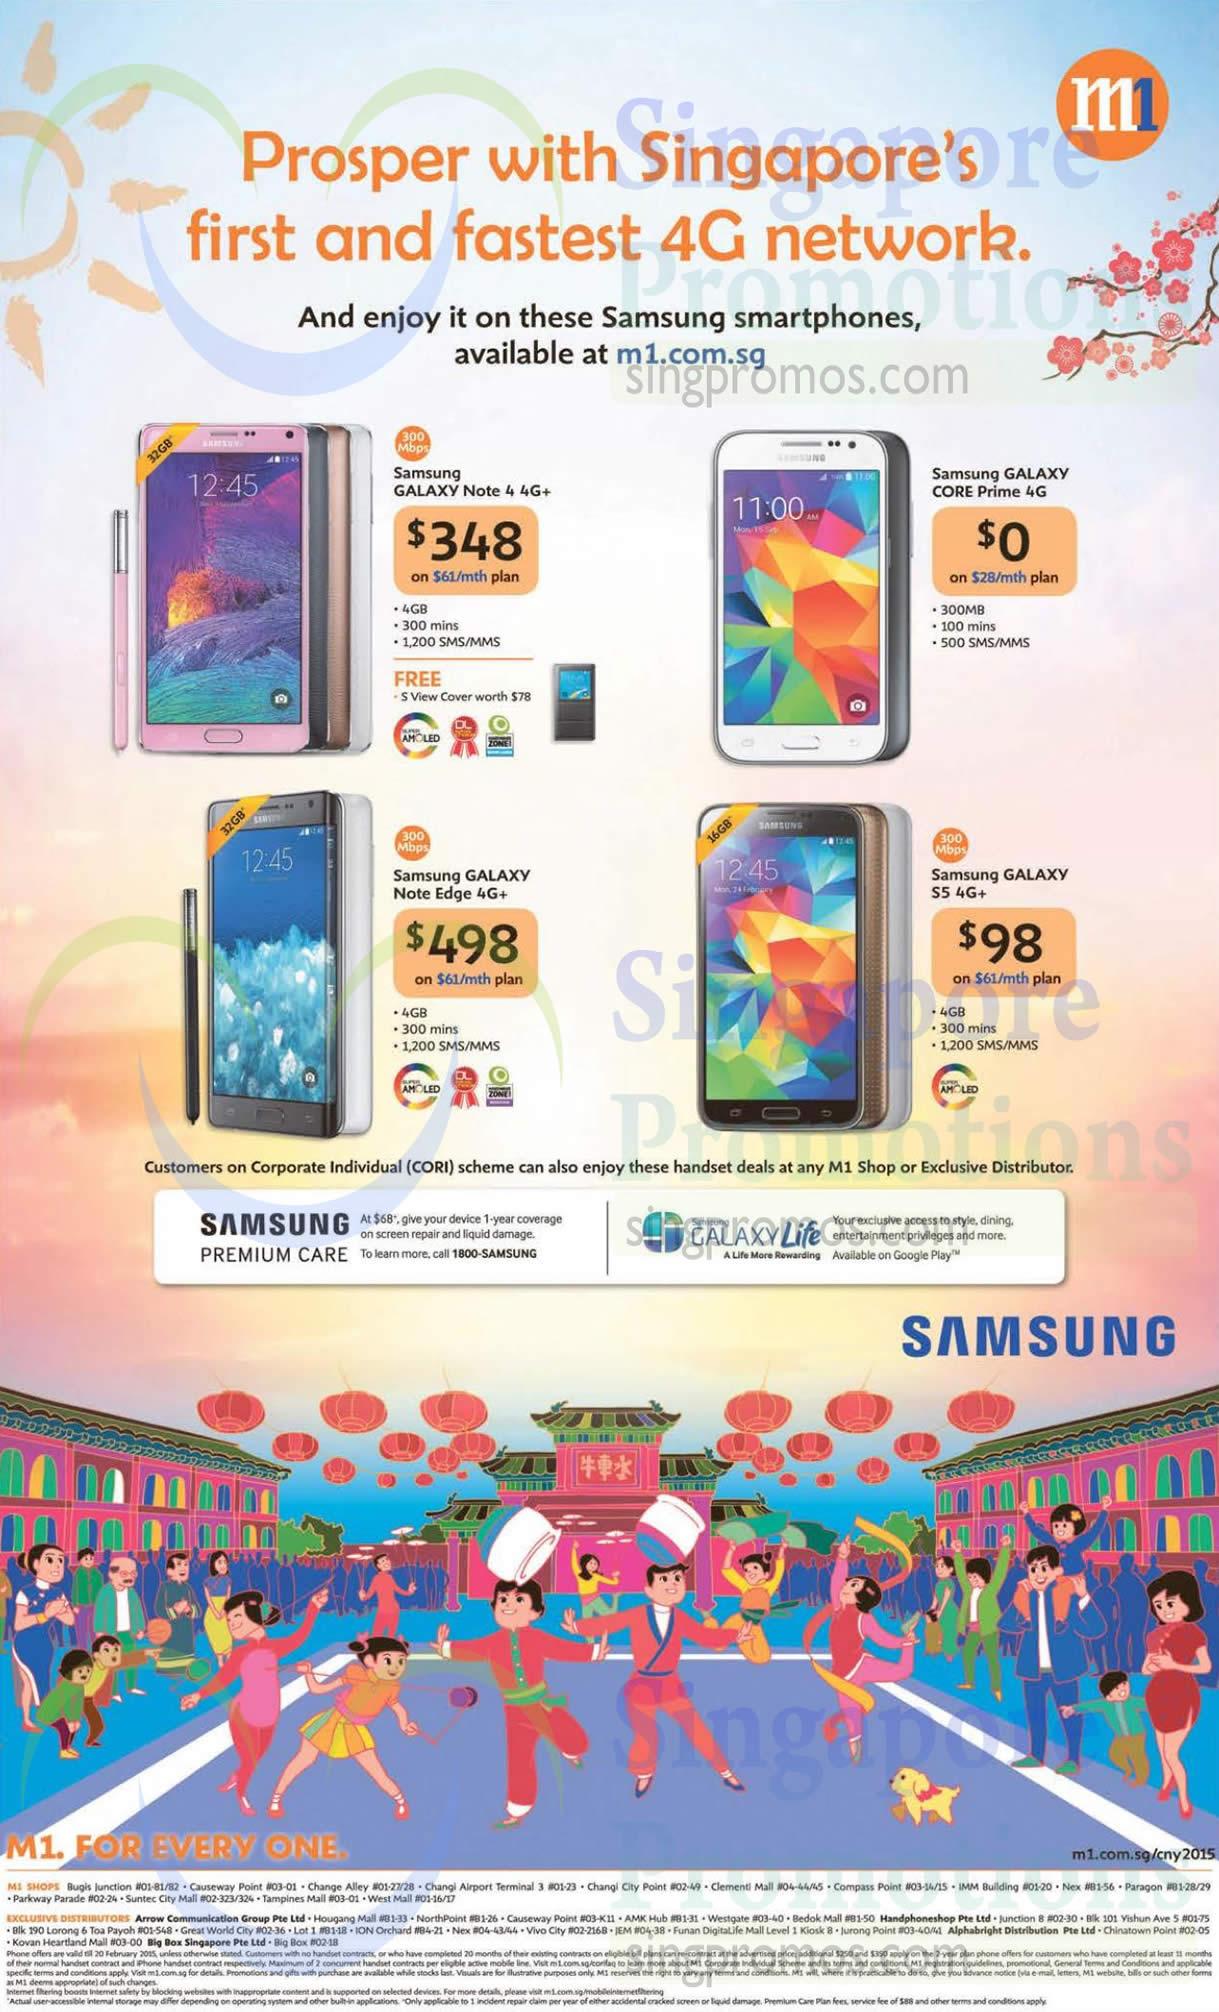 Samsung Galaxy Note 4, Samsung Galaxy Core Prime, Samsung Galaxy Note Edge, Samsung Galaxy S5